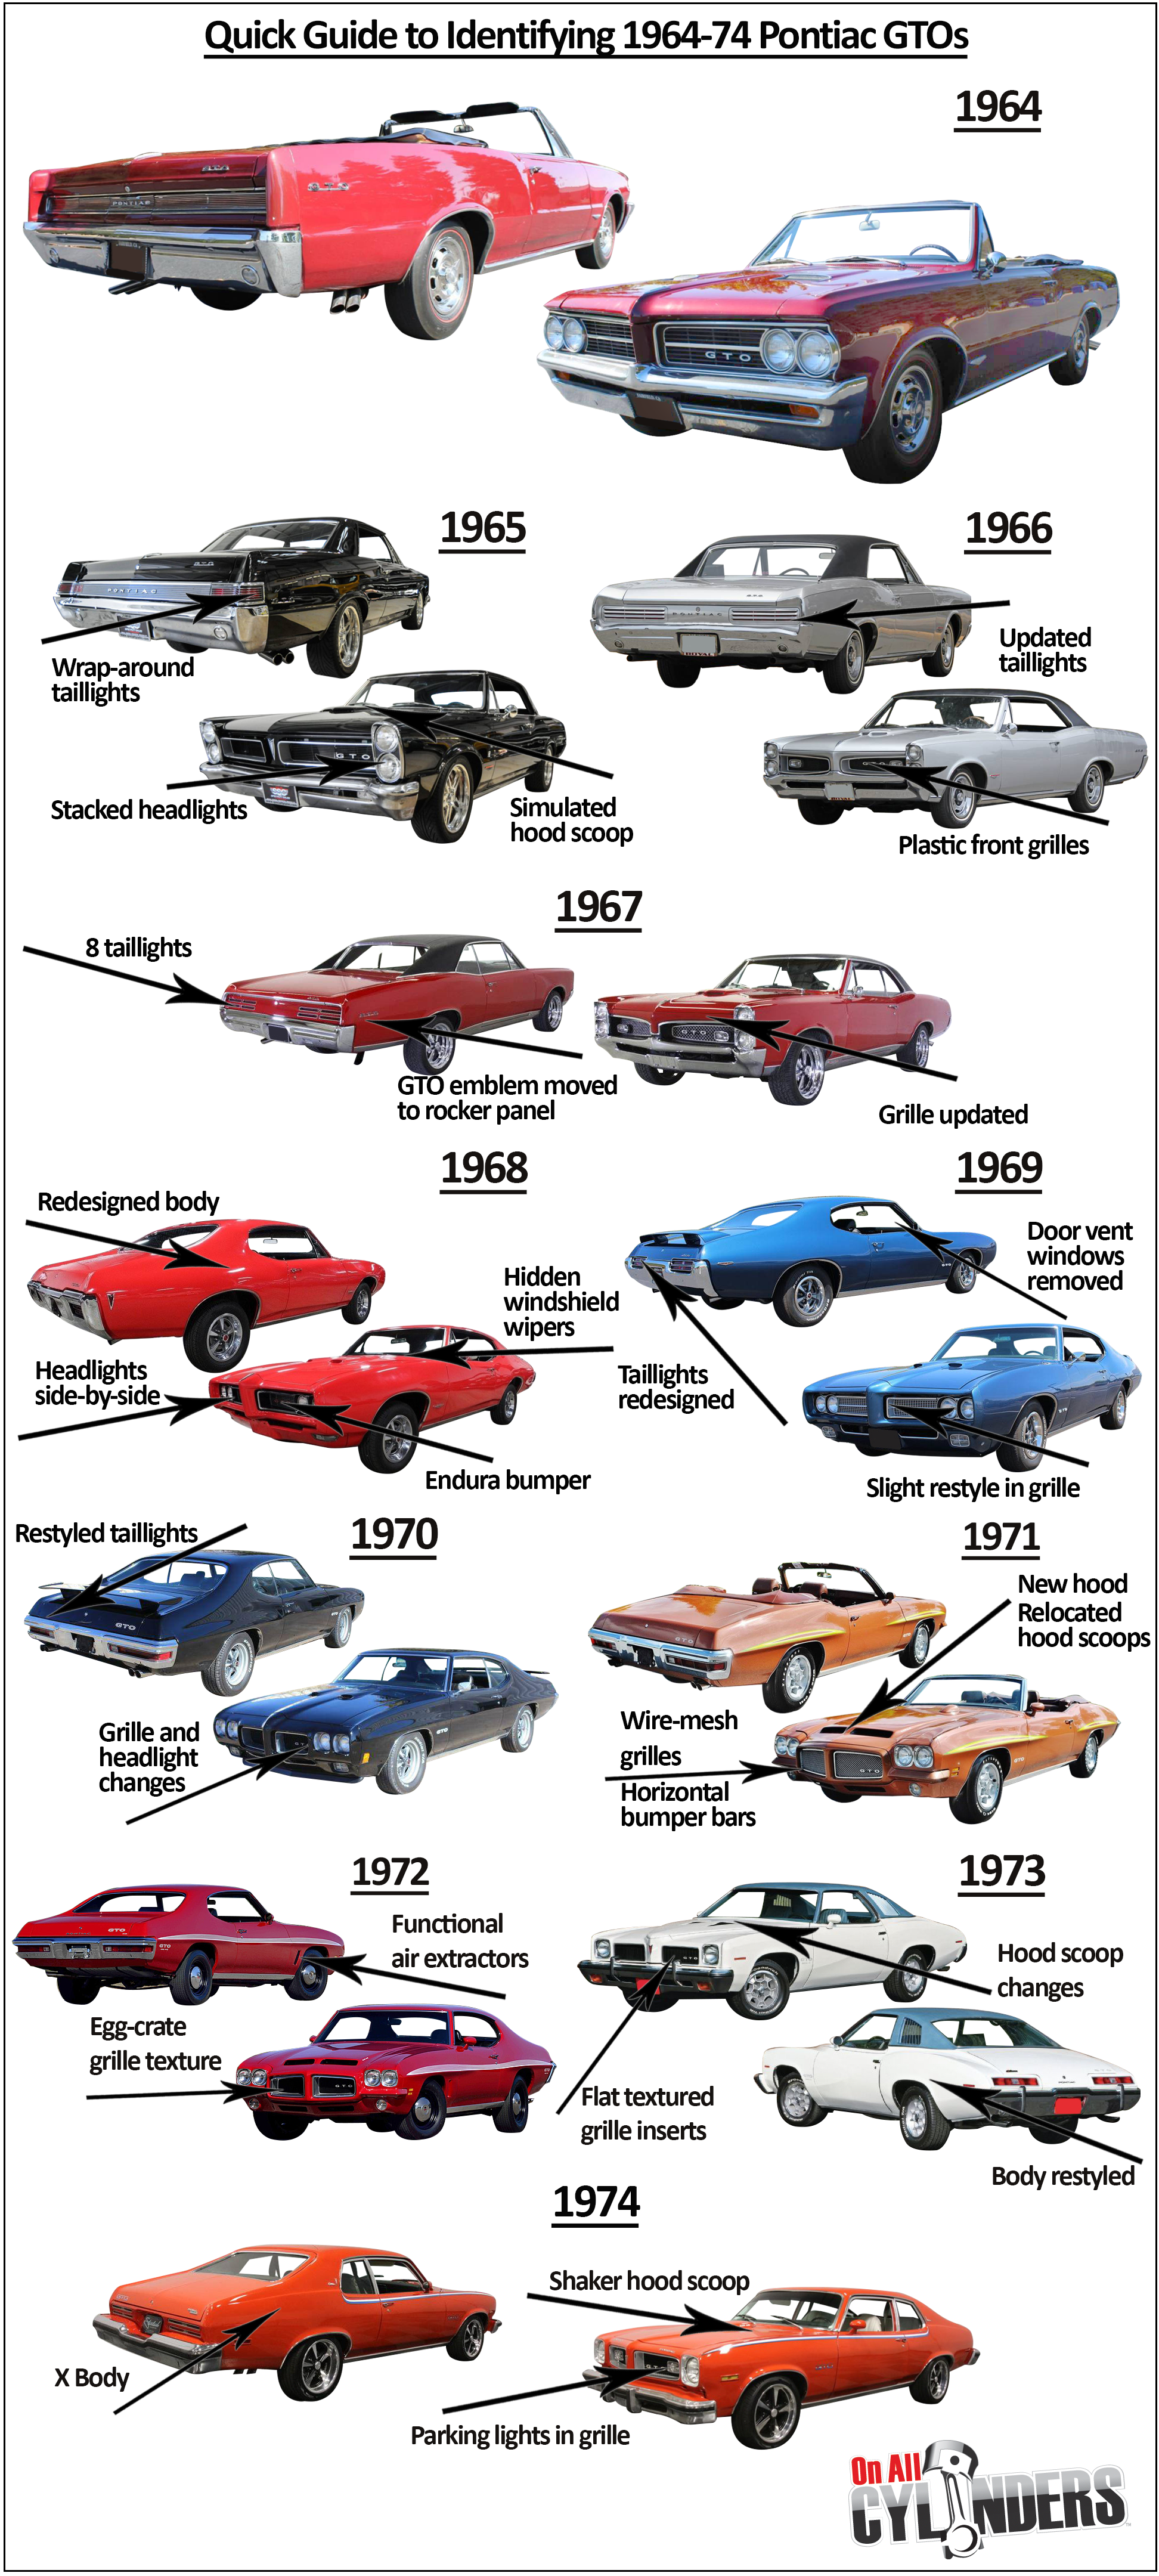 The original American muscle car Collectors Card Series PONTIAC GTO 1964-74